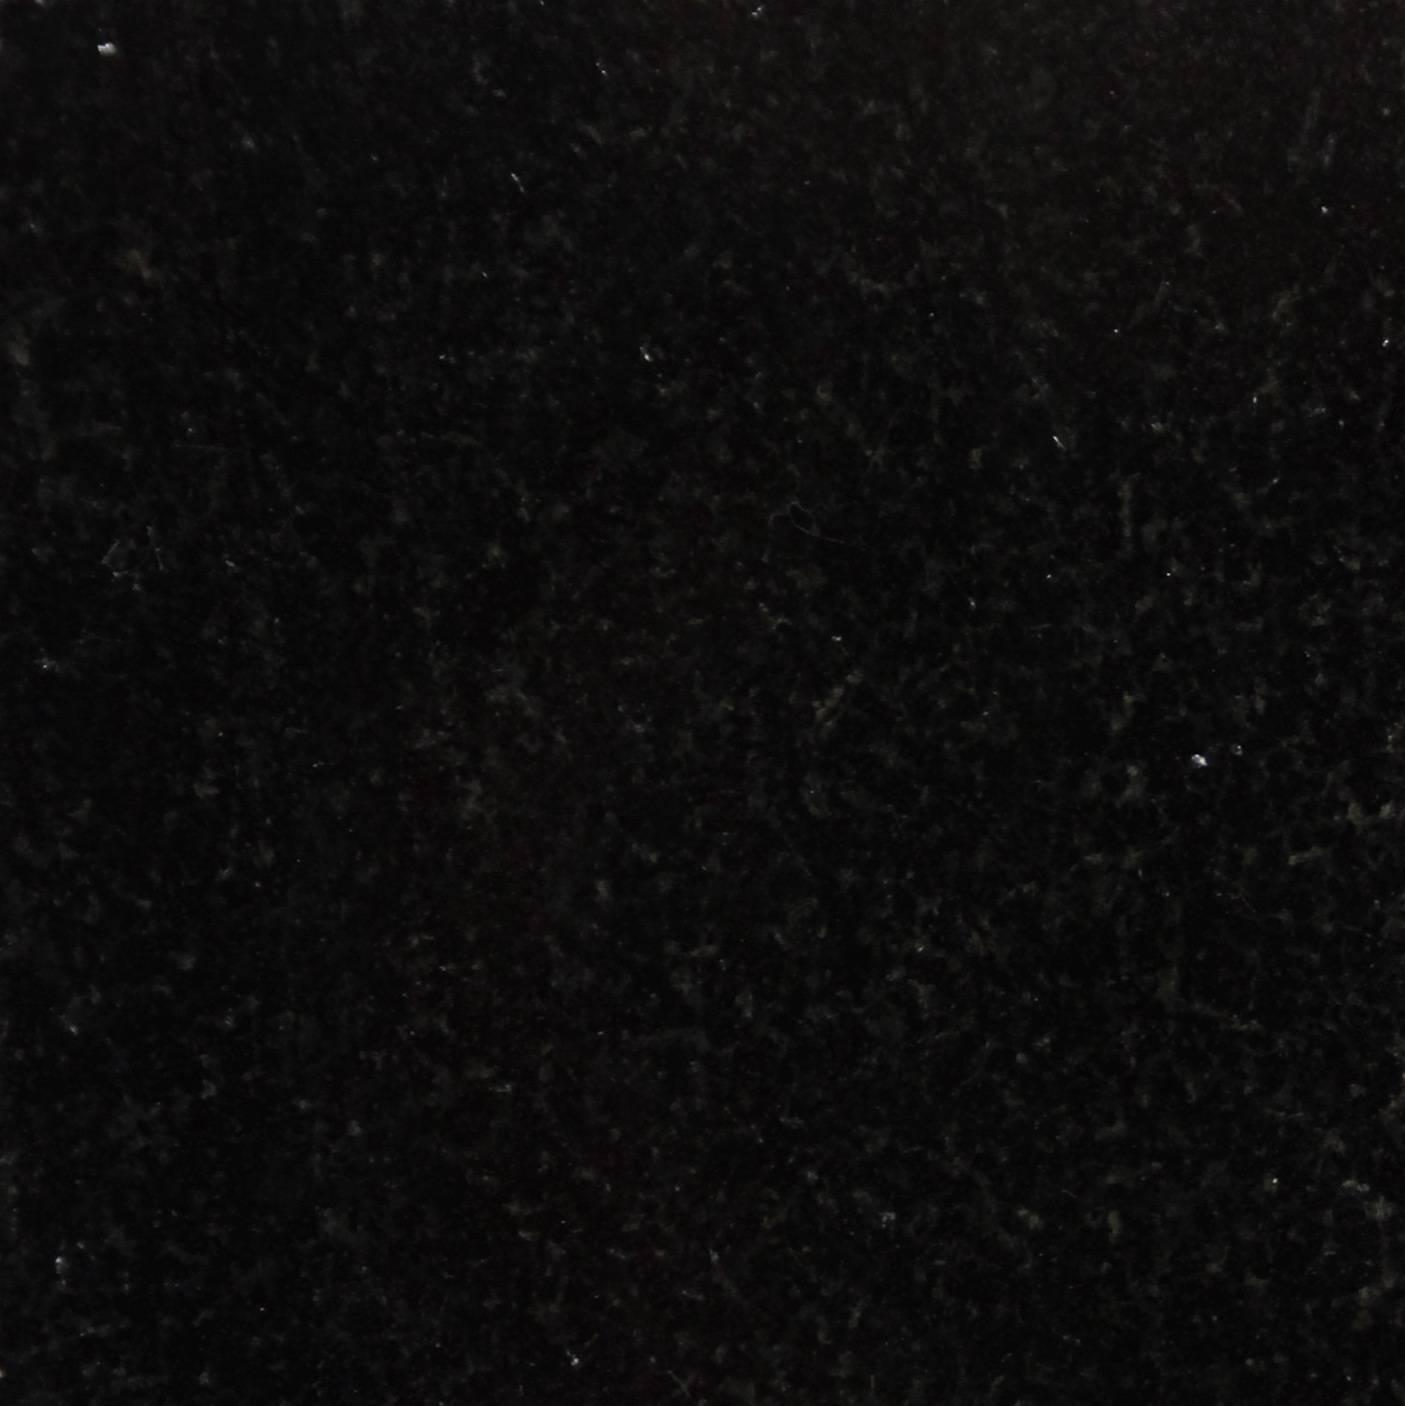 30. bsolute-blackbis_2